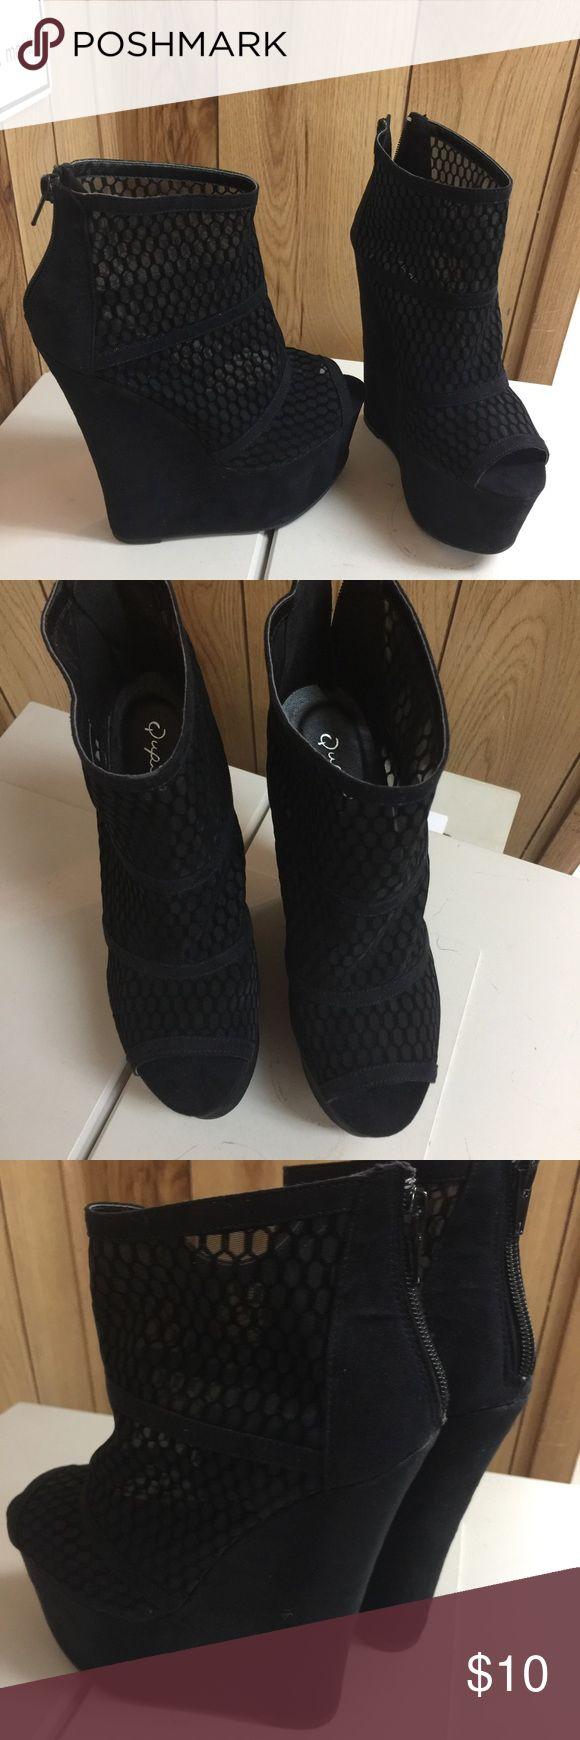 BNIB Black Caged Platform Shoe Size 7 BNIB/// Black Platform Caged Shoe///Zipper Back///Peep Toe Qupid Shoes